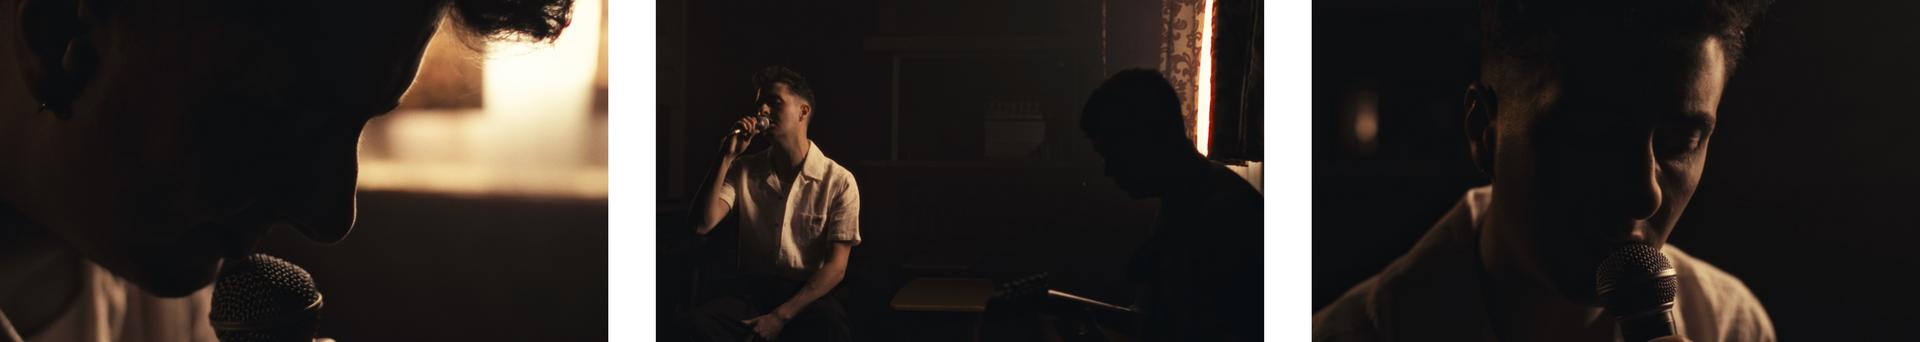 Joesef - I Wonder Why (Acoustic)